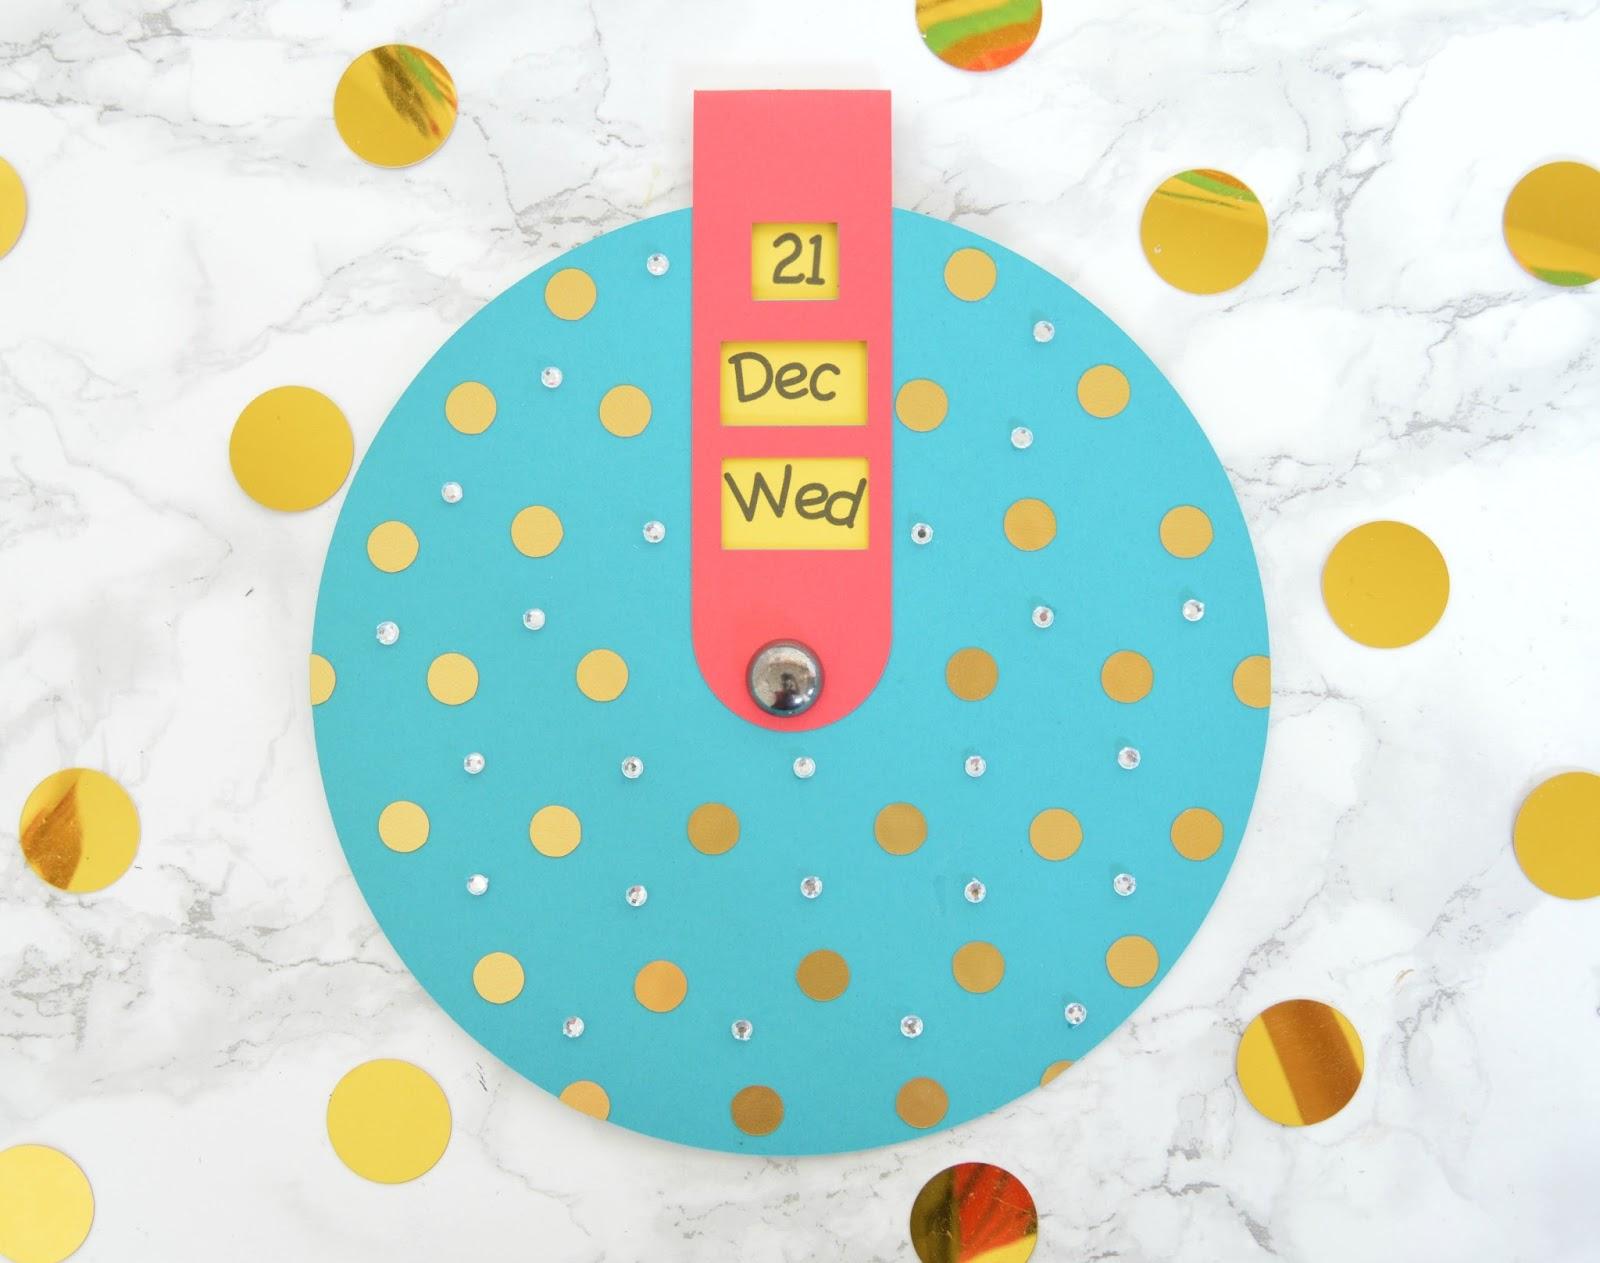 Calendar Design Diy : Free printable calendar for an organized workspace the weathered fox